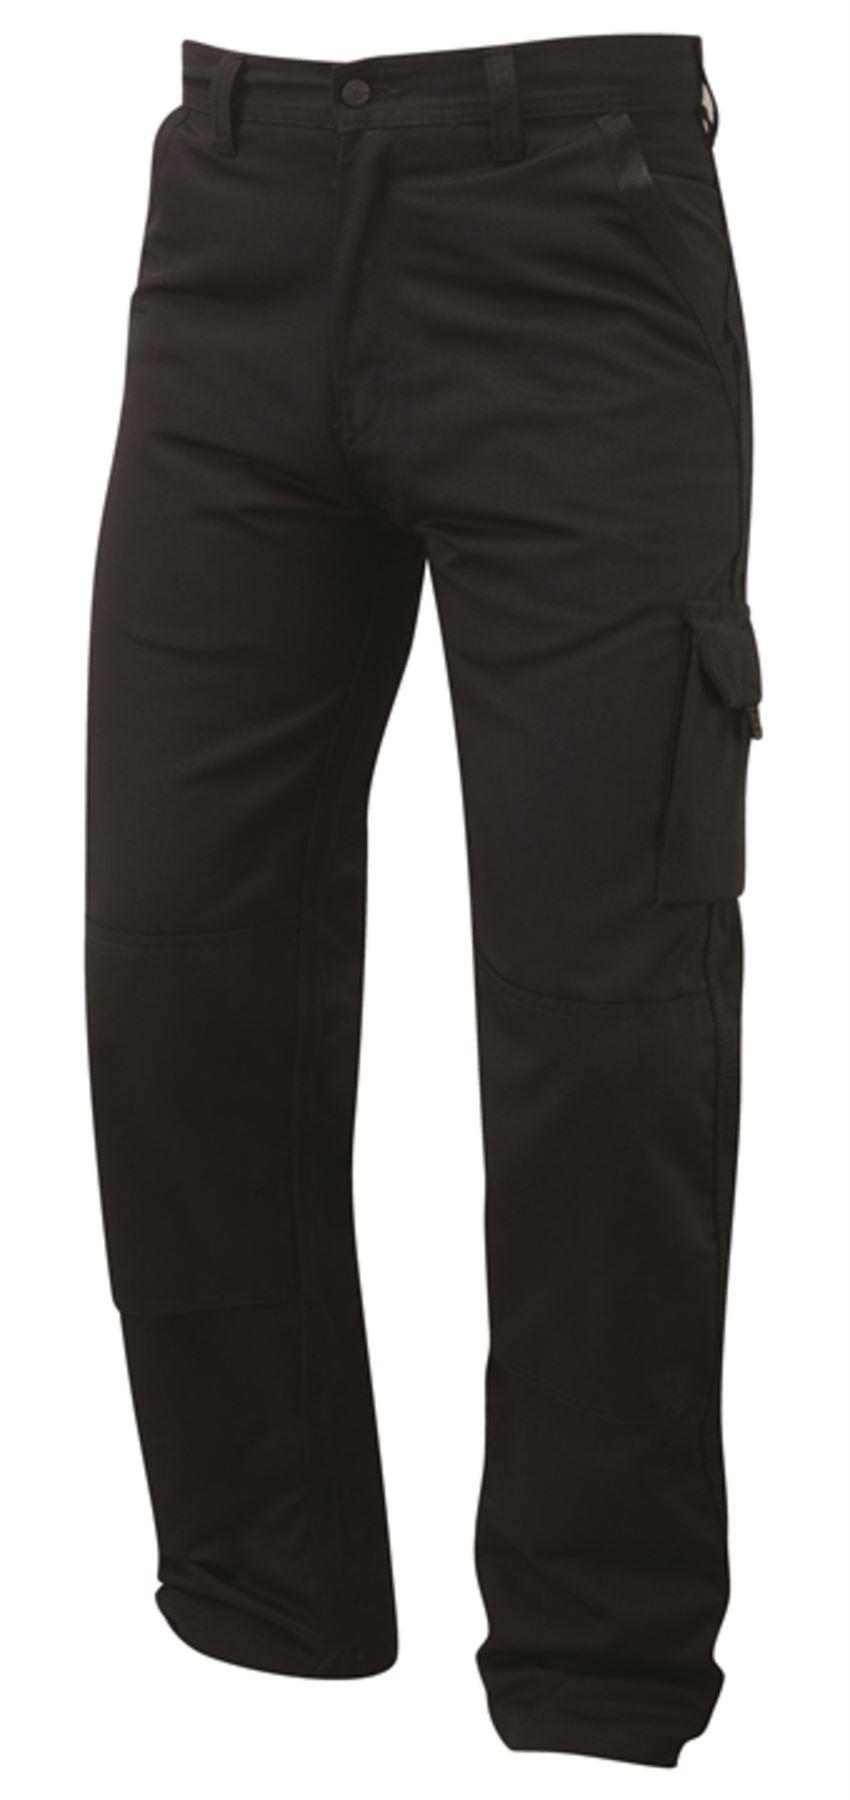 Orn Heron Kneepad Combat Trousers - Black|50W35L